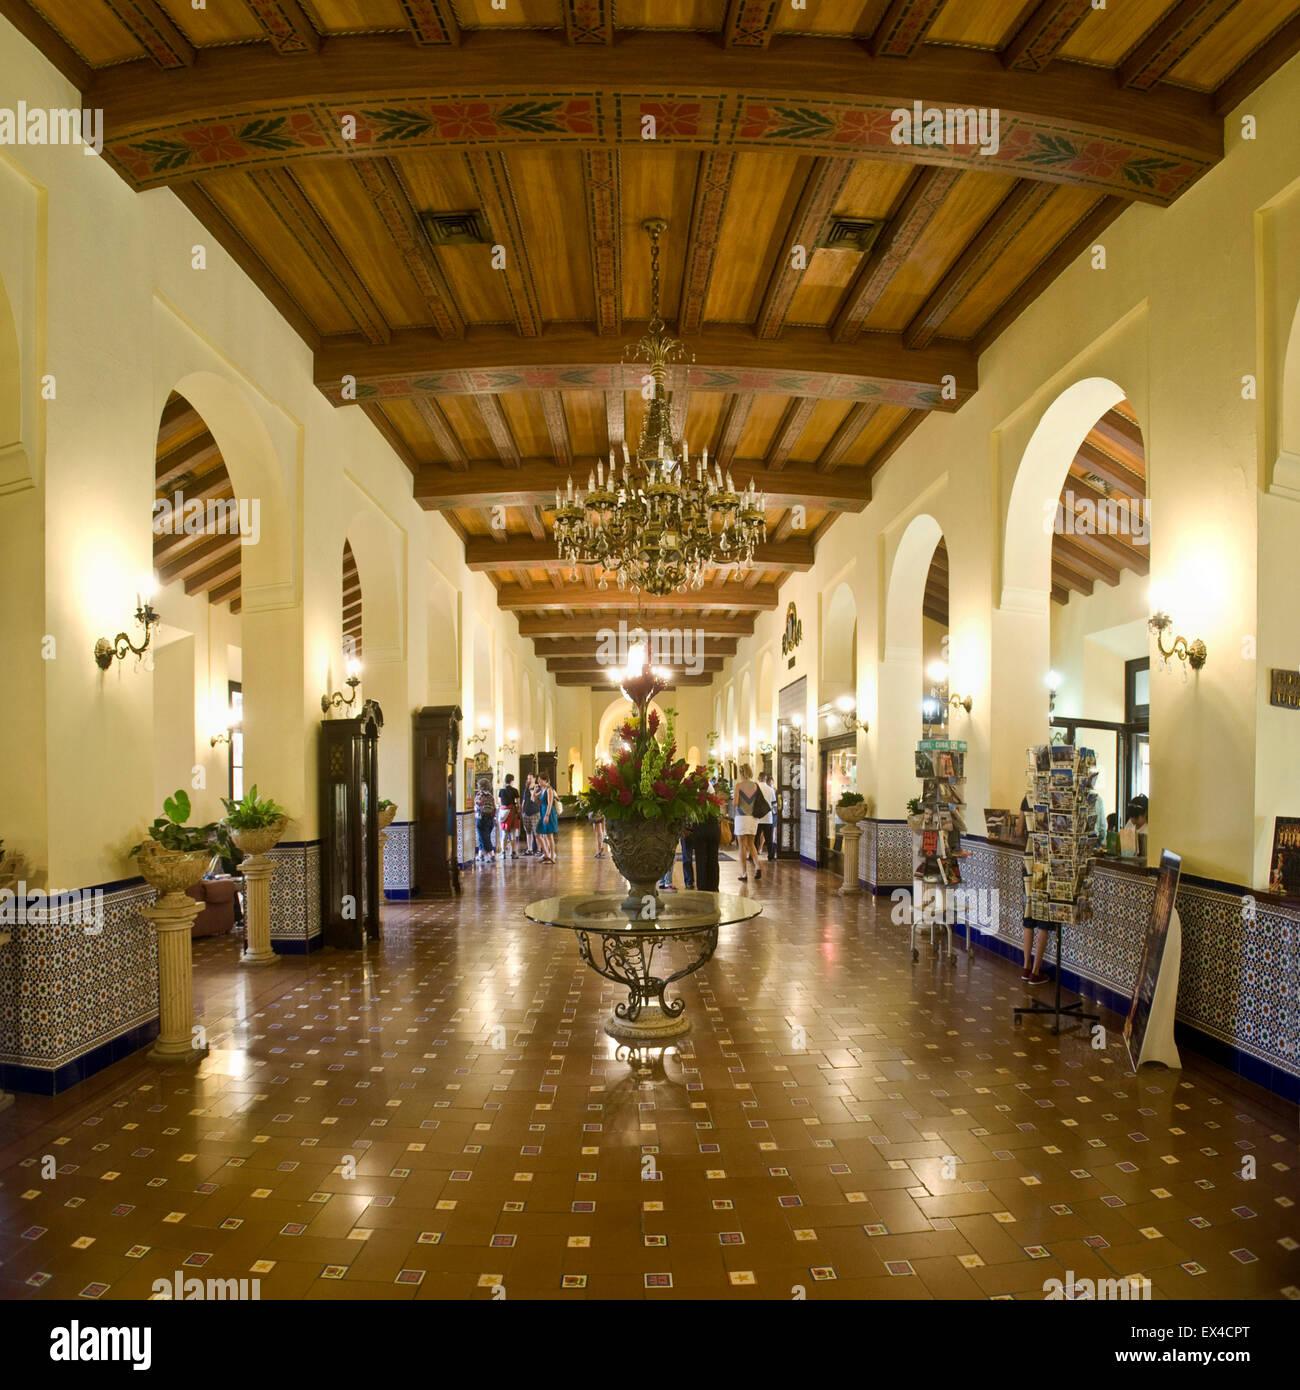 Square Interior View Of Hotel Nacional De Cuba In Havana Stock Photo Alamy